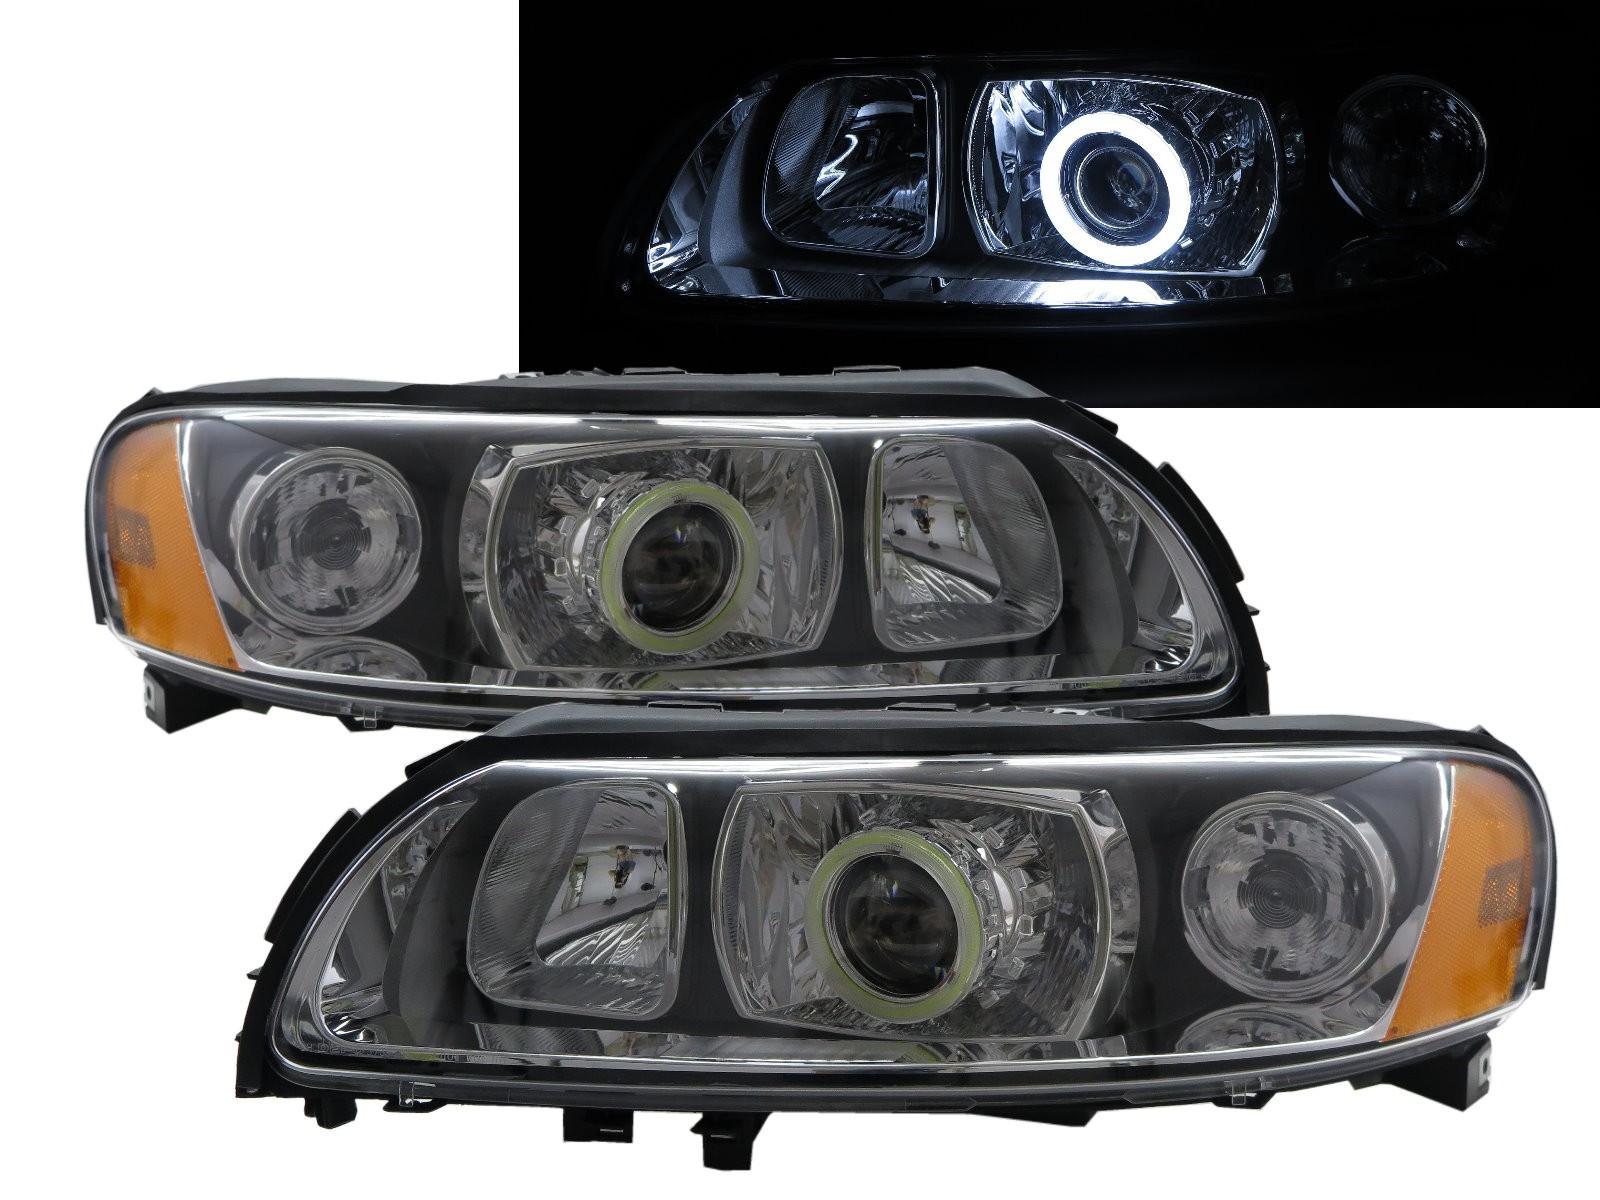 CrazyTheGod V70/XC70 Second generation 2004-2007 Wagon 5D COB Projector Headlight Headlamp Black for VOLVO RHD